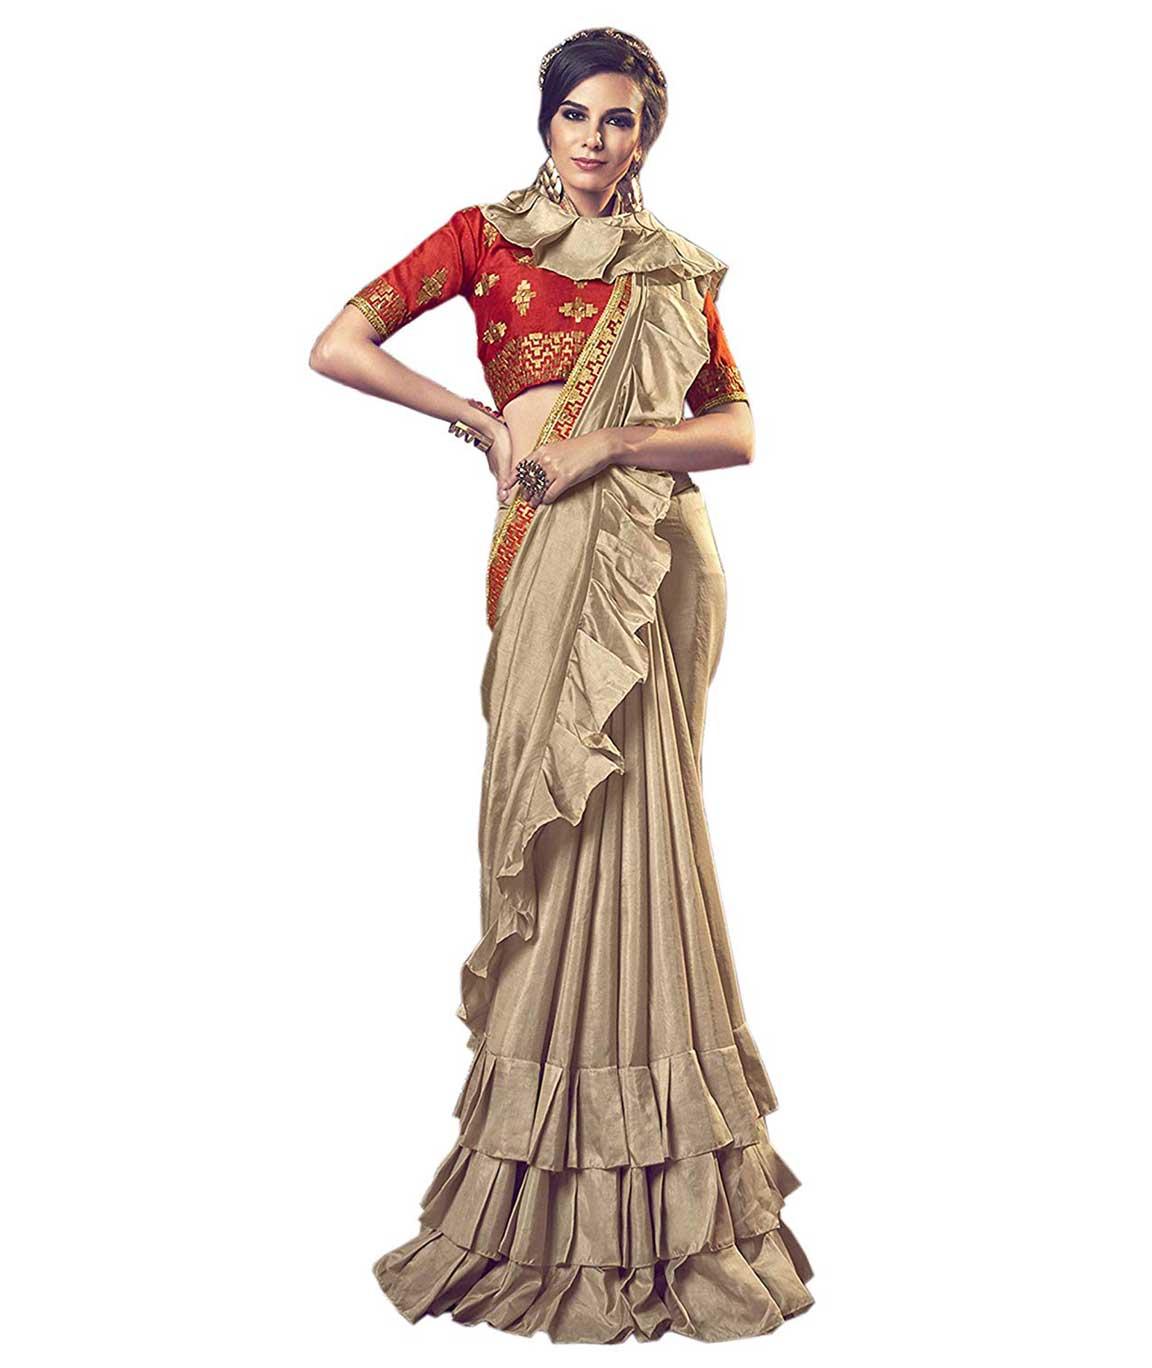 Shangrila Designer Women`s Ruffled Pattern Border Chinon Silk Saree with Blouse Piece (CINDRELLA-20073 Dirt Beige)